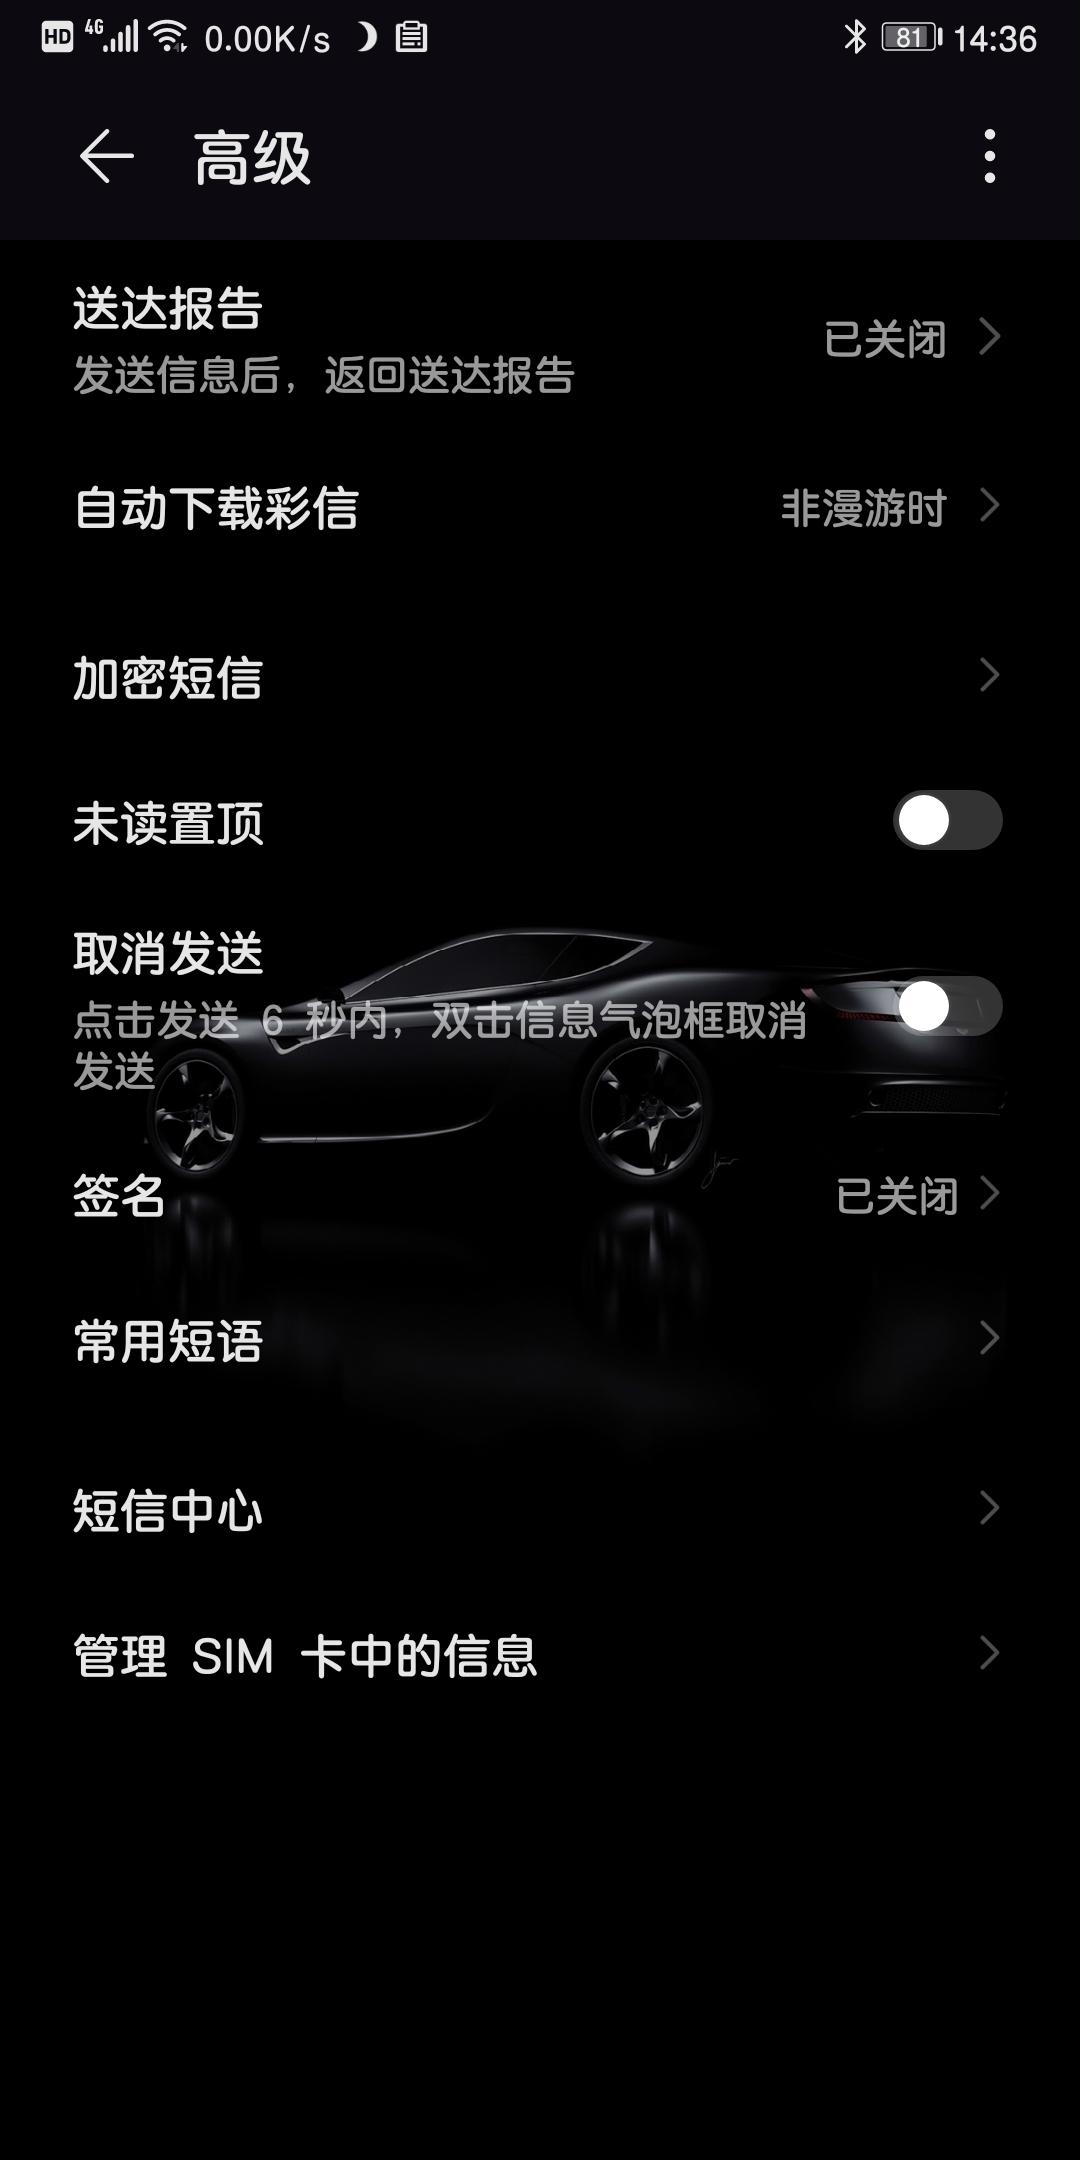 Screenshot_20200303_143621_com.android.mms.jpg